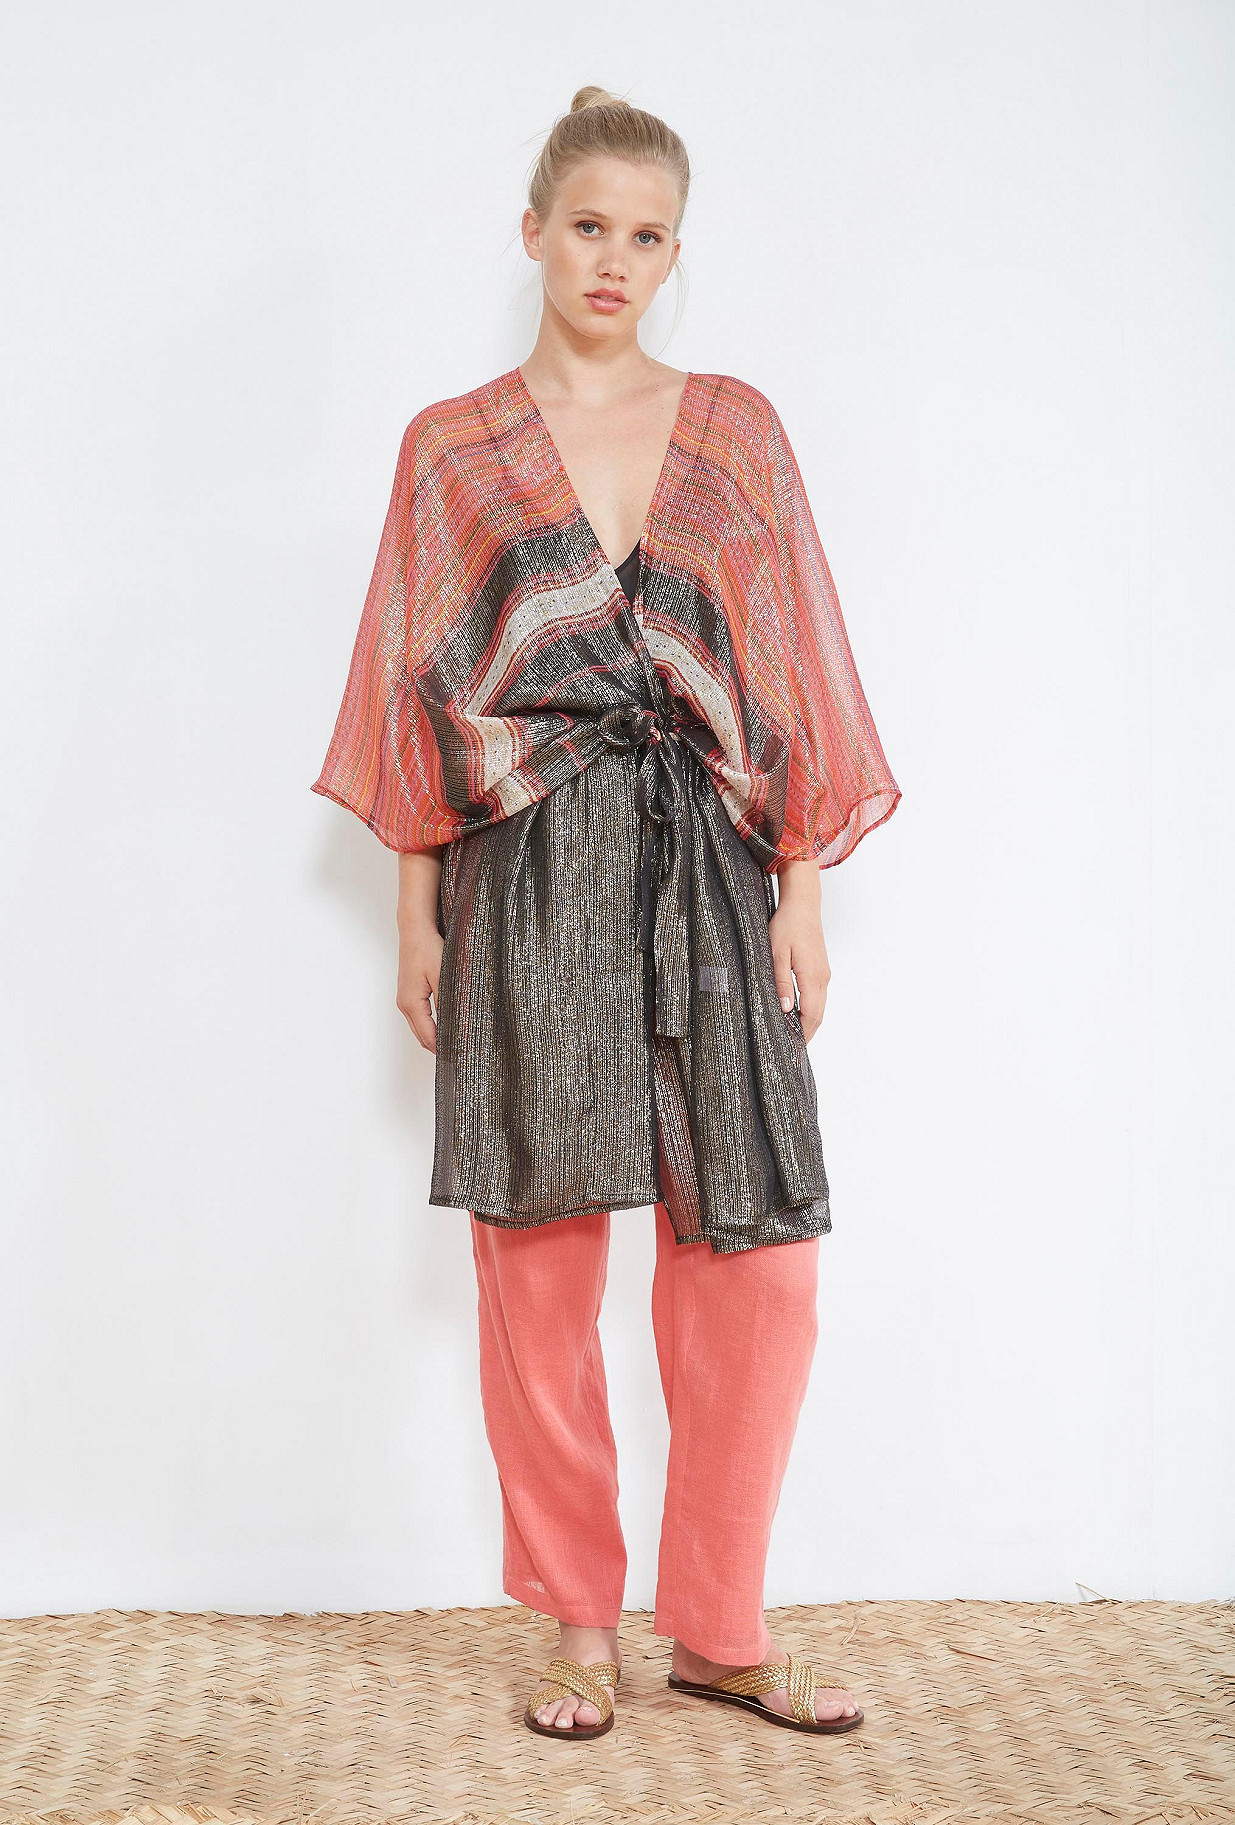 Black  KIMONO  Daraphet Mes demoiselles fashion clothes designer Paris